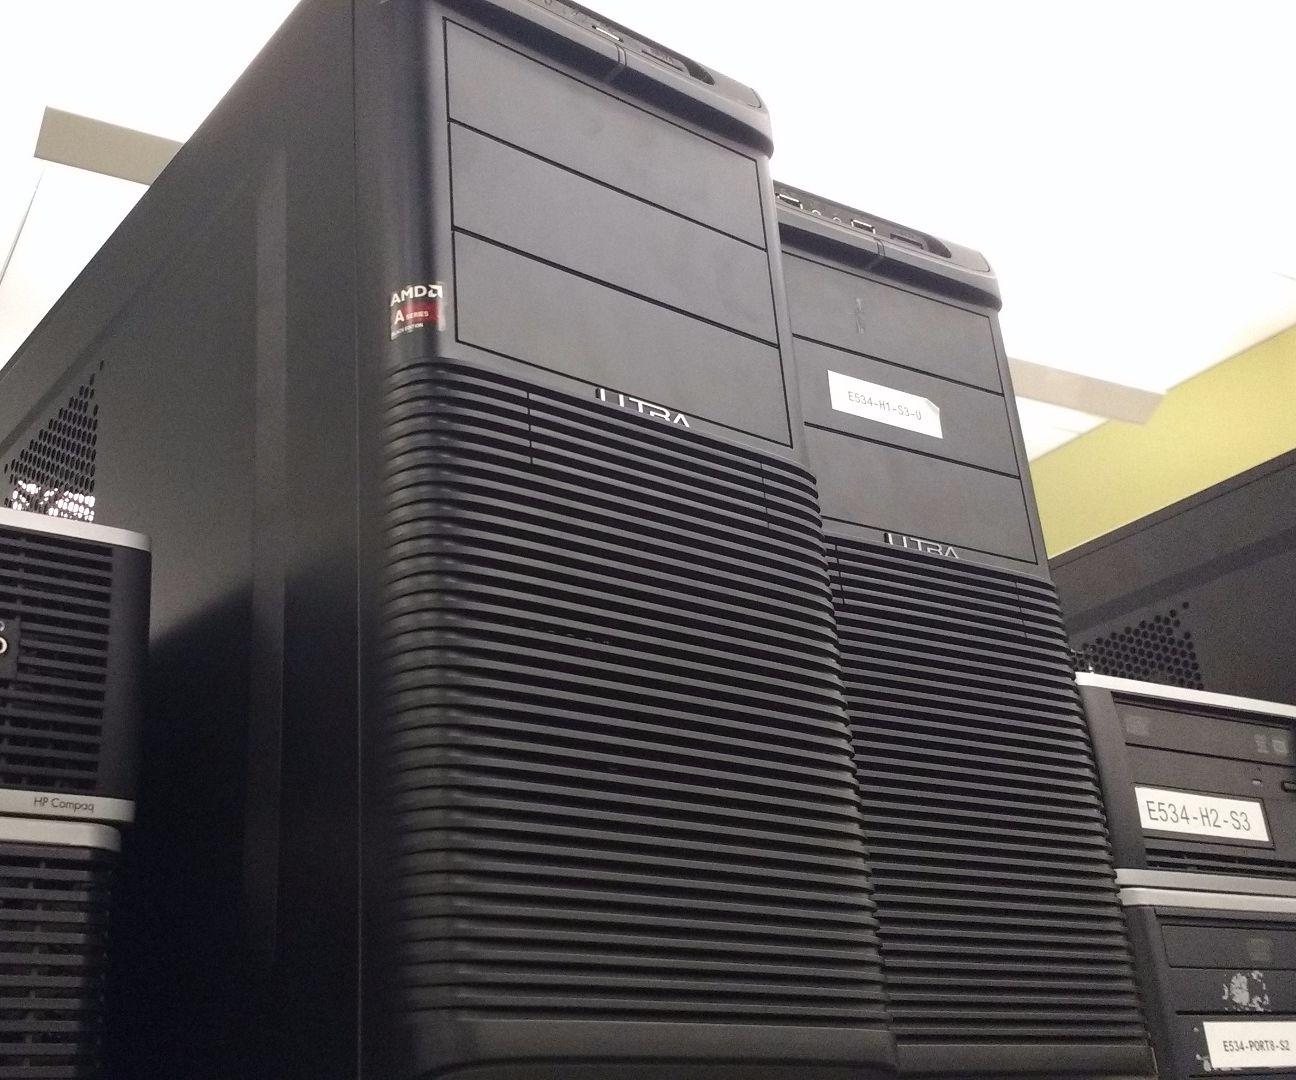 AMD Computer Build